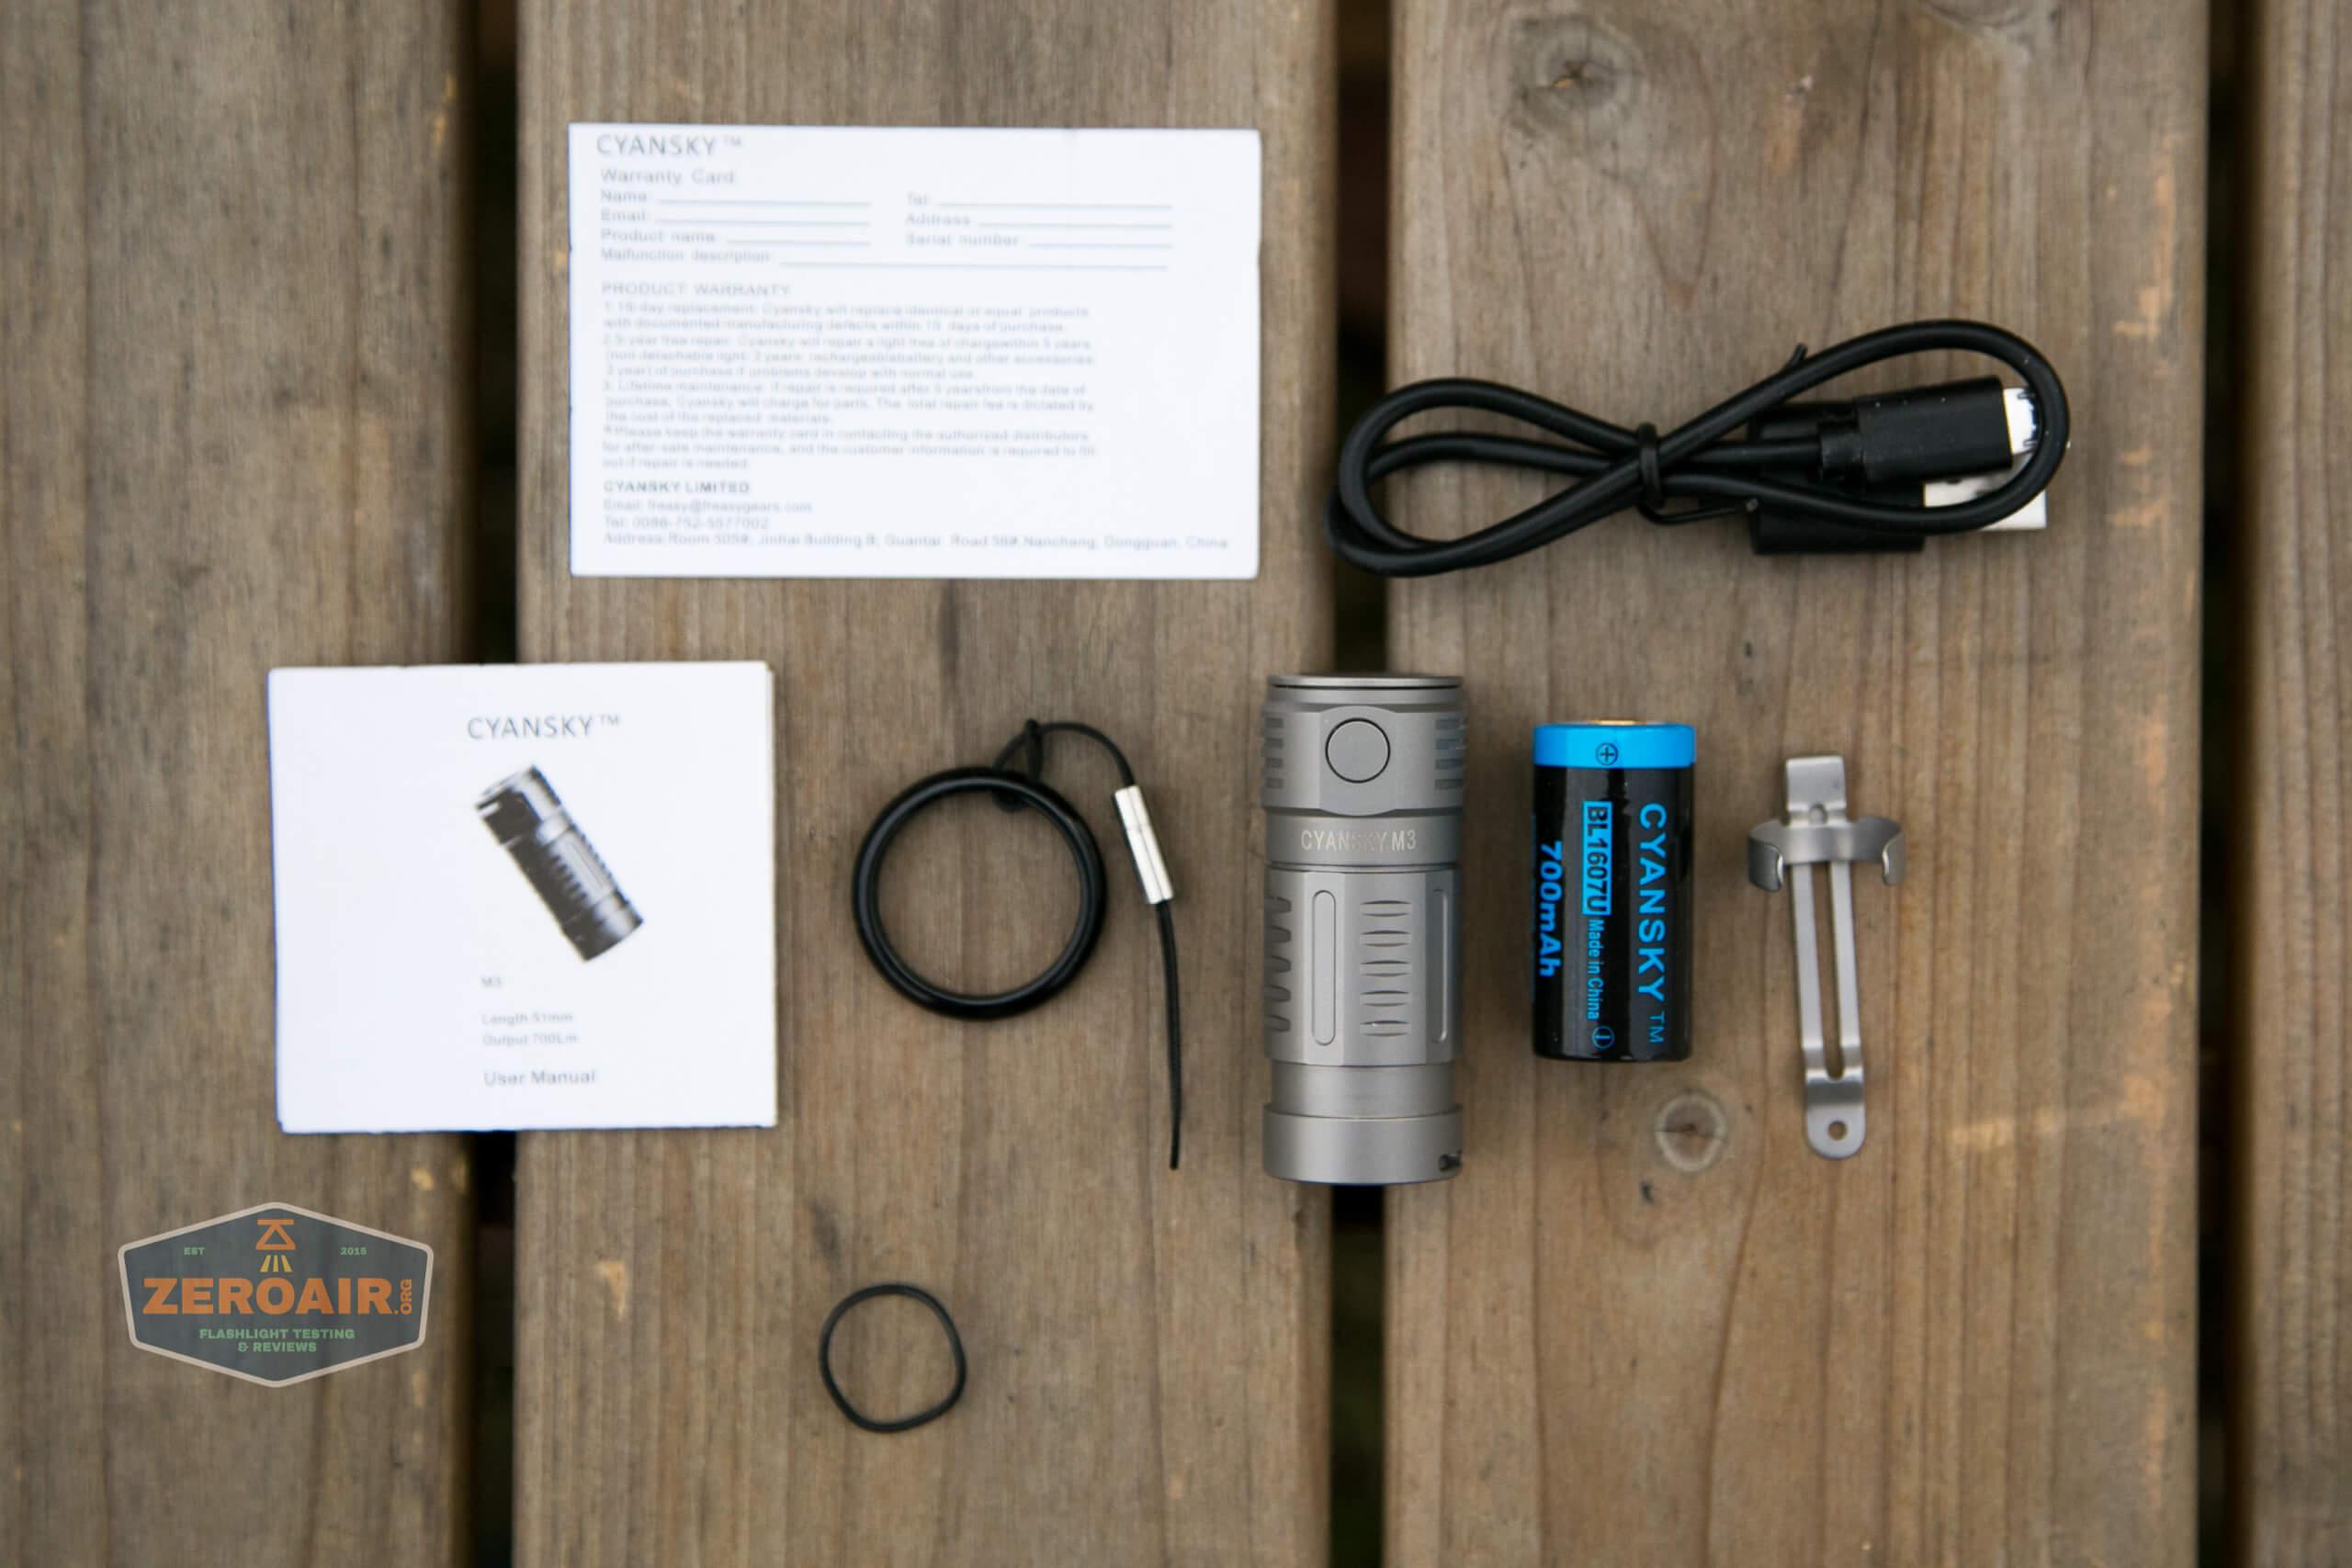 freasygears cyansky m3 titanium pocket flashlight what's included